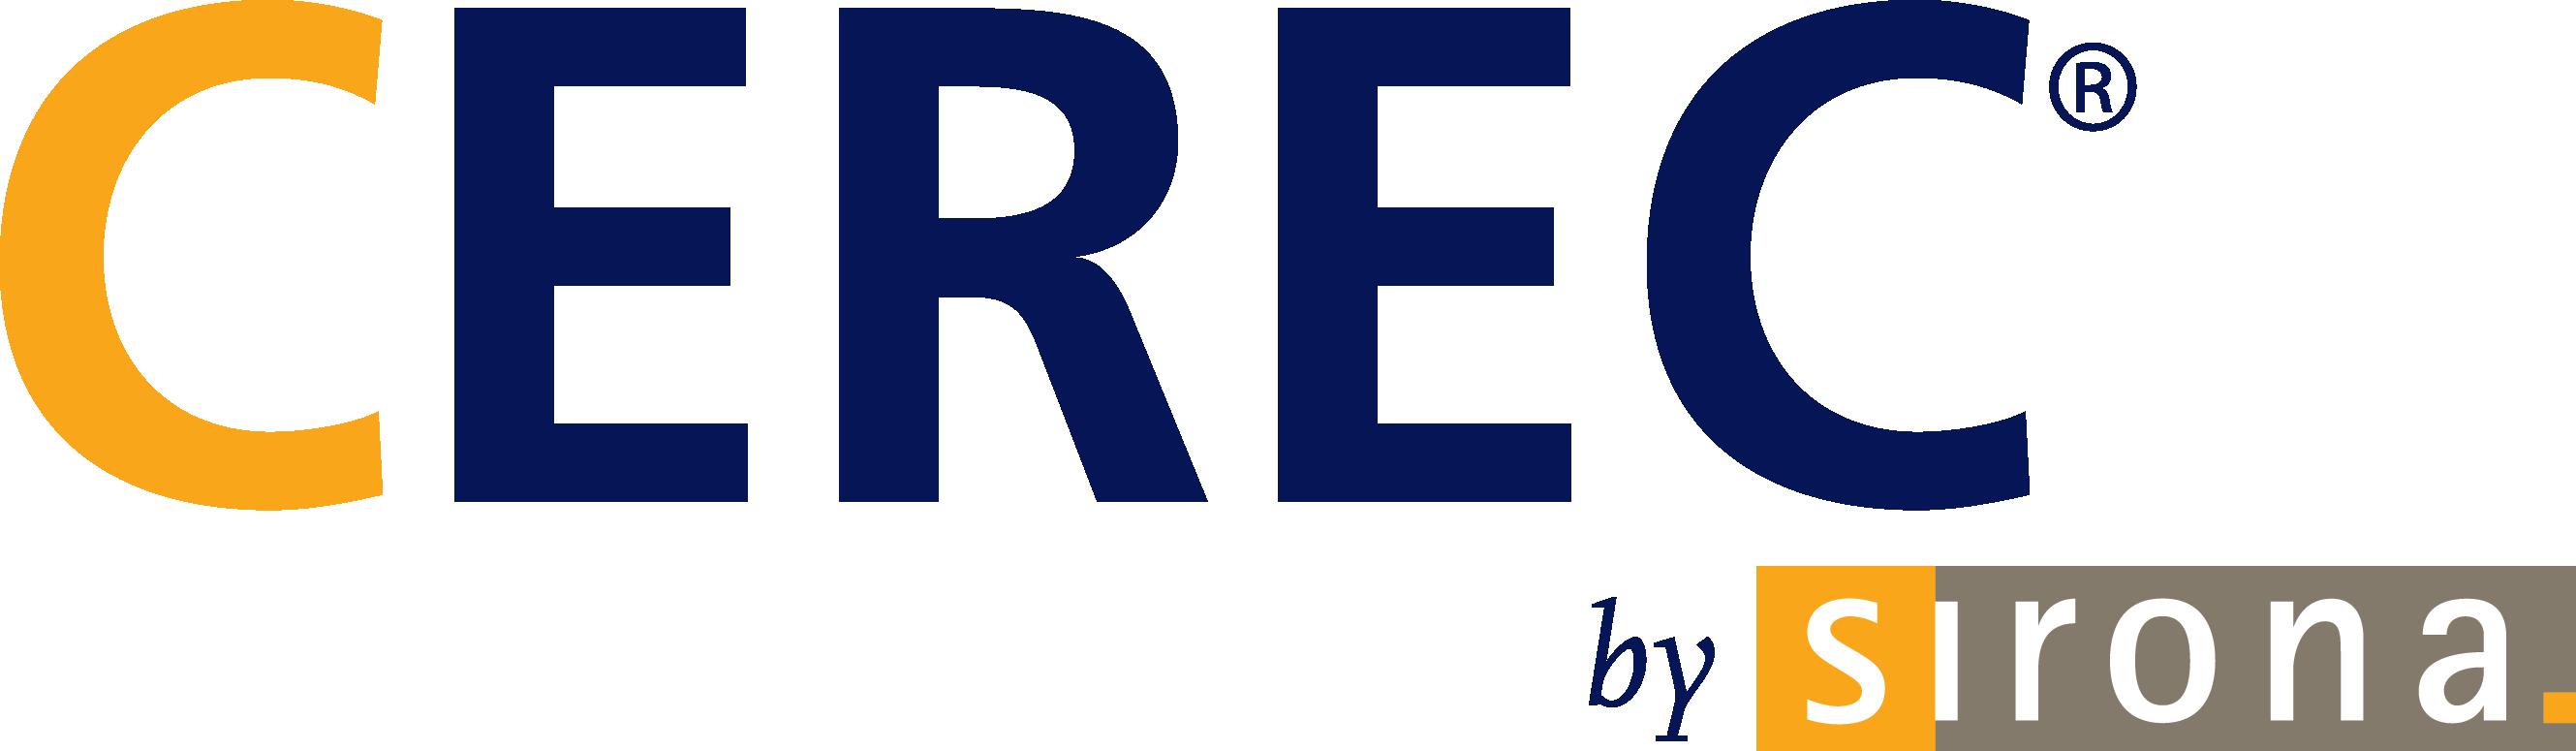 Harbrouck Heights Dentist | Bergen County Dentist | CEREC one visit crowns | Robert L. Leung DDS